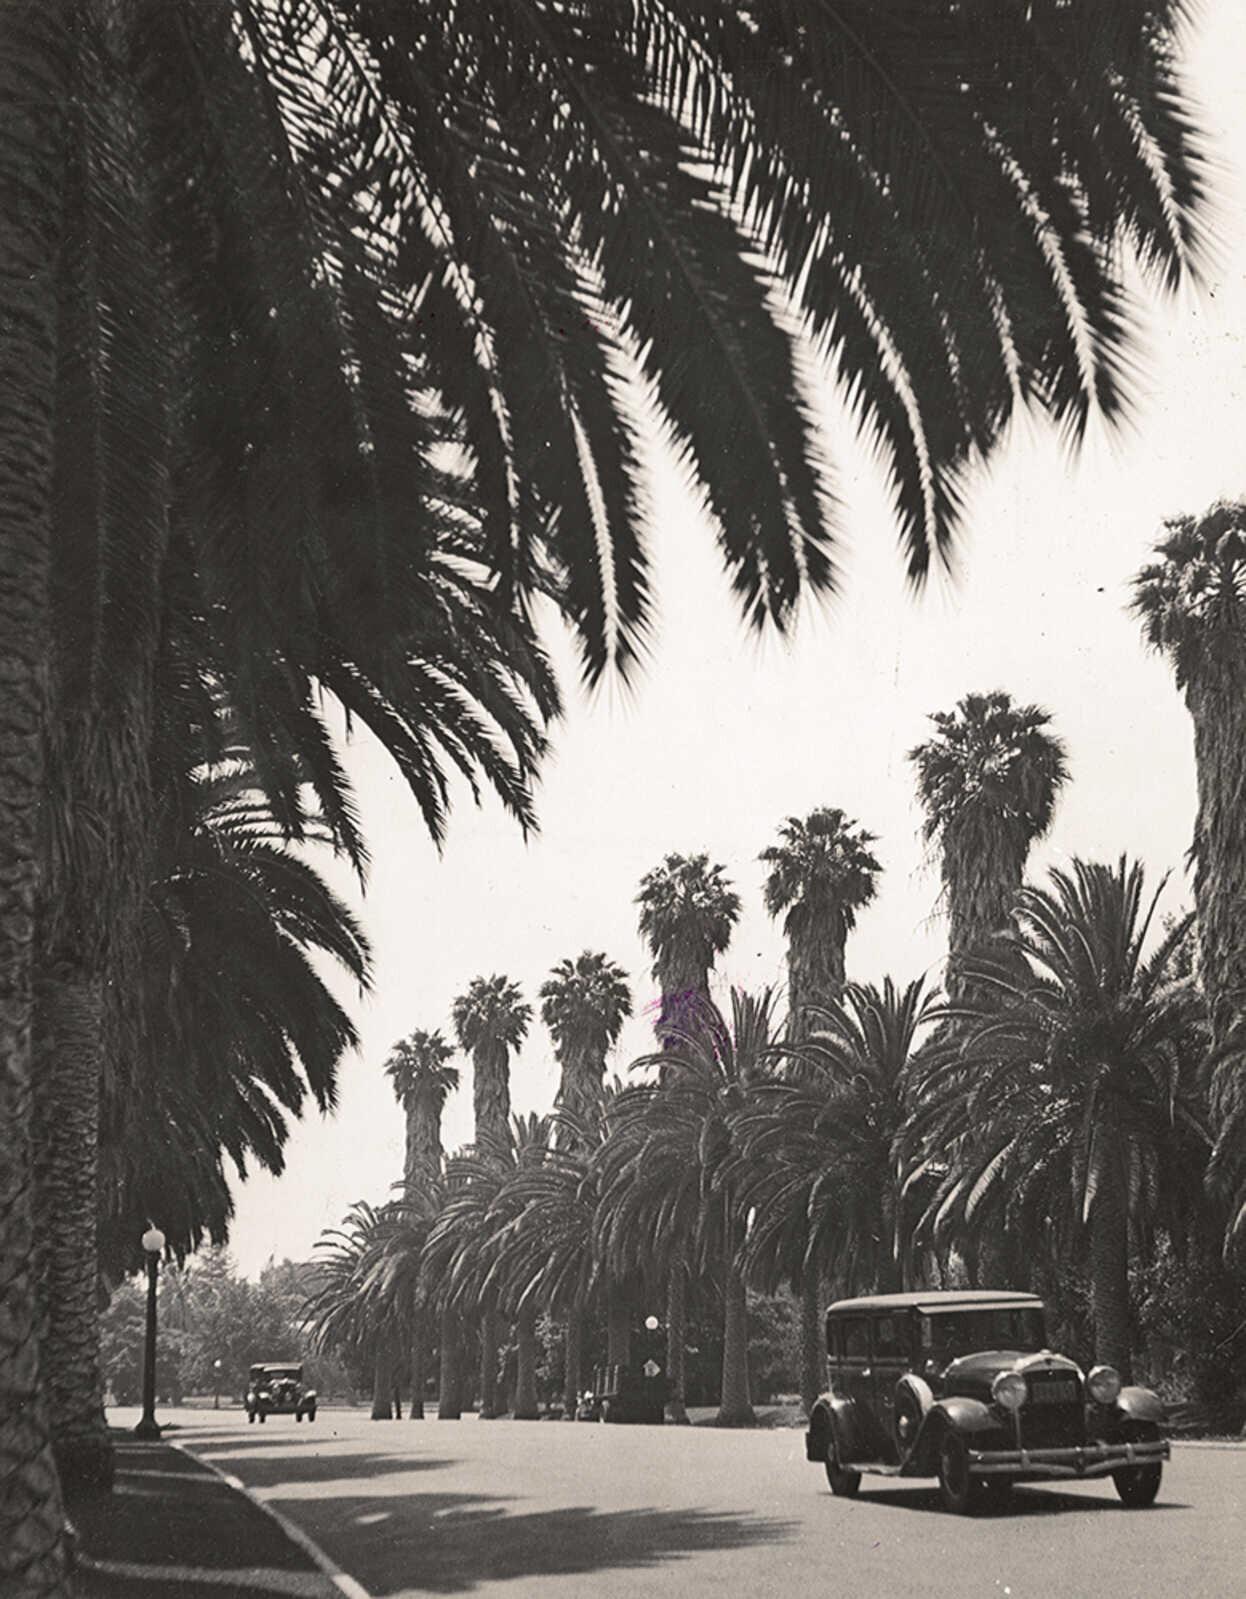 Беверли-Хиллз, Калифорния, 1936. Фотограф Альфред Эйзенштадт